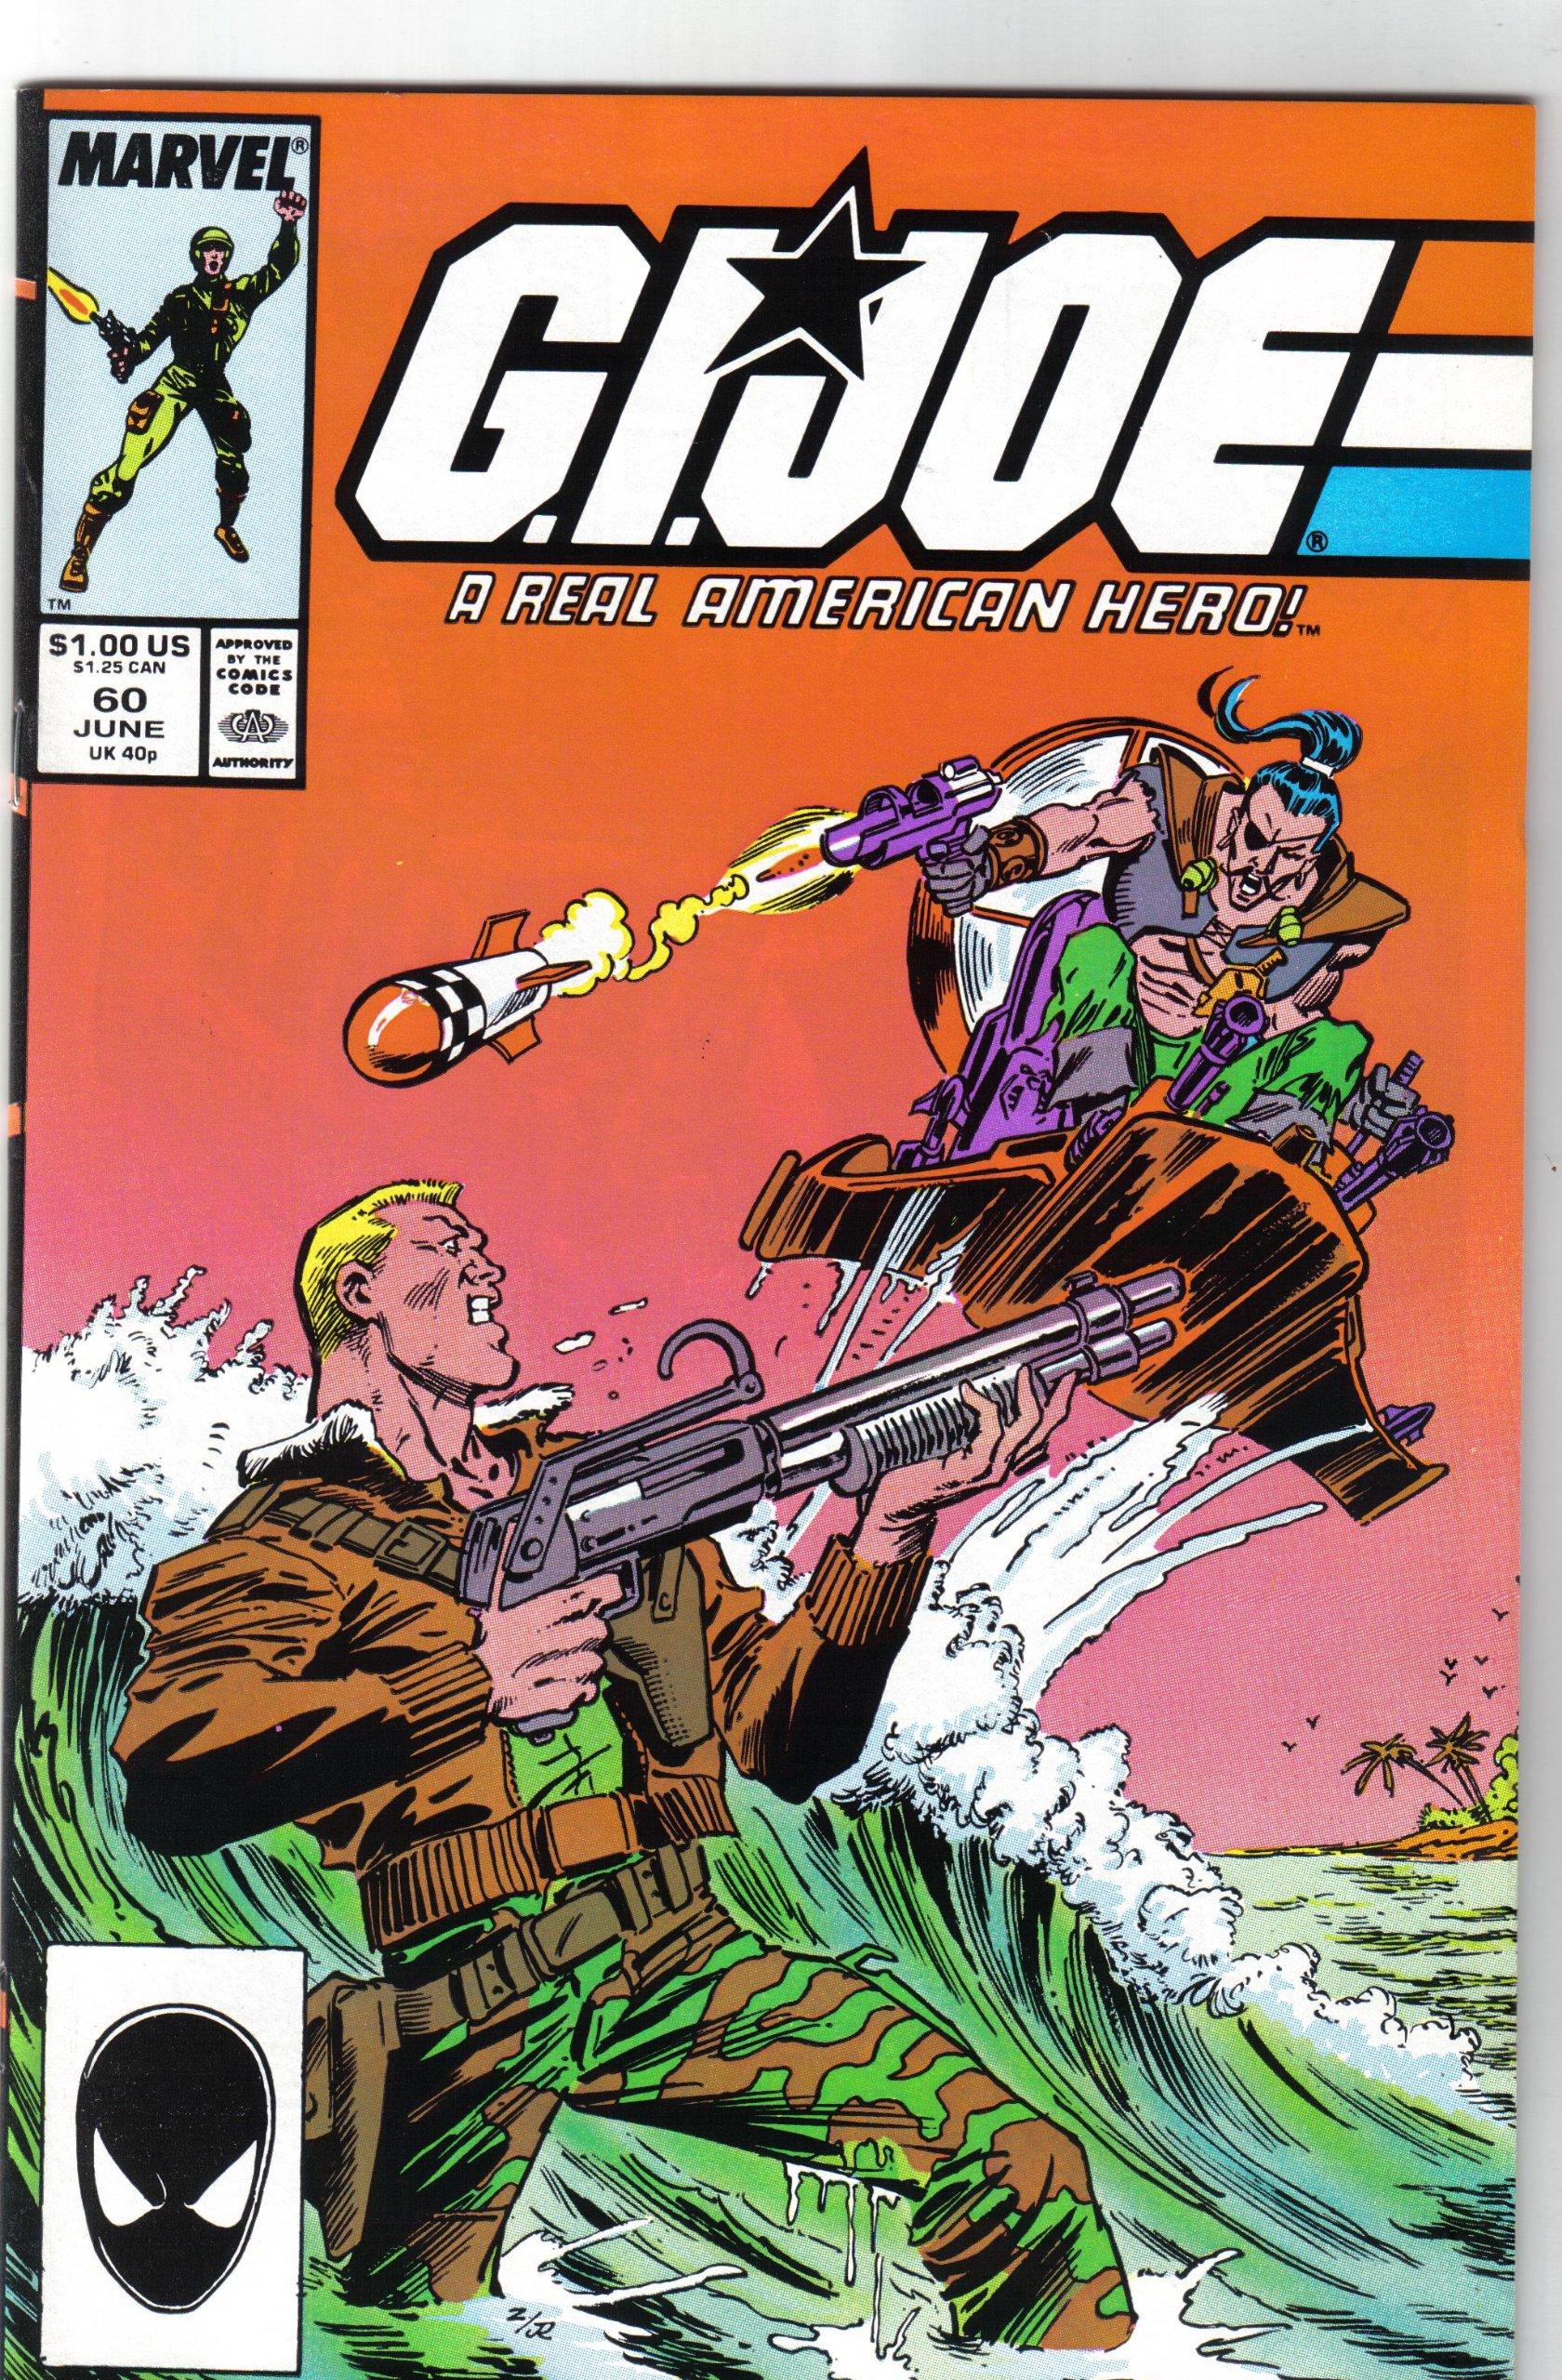 1ST CHUCKLES 1987 MARVEL TODD McFARLANE ART G.I JOE A REAL AMERICAN HERO #60